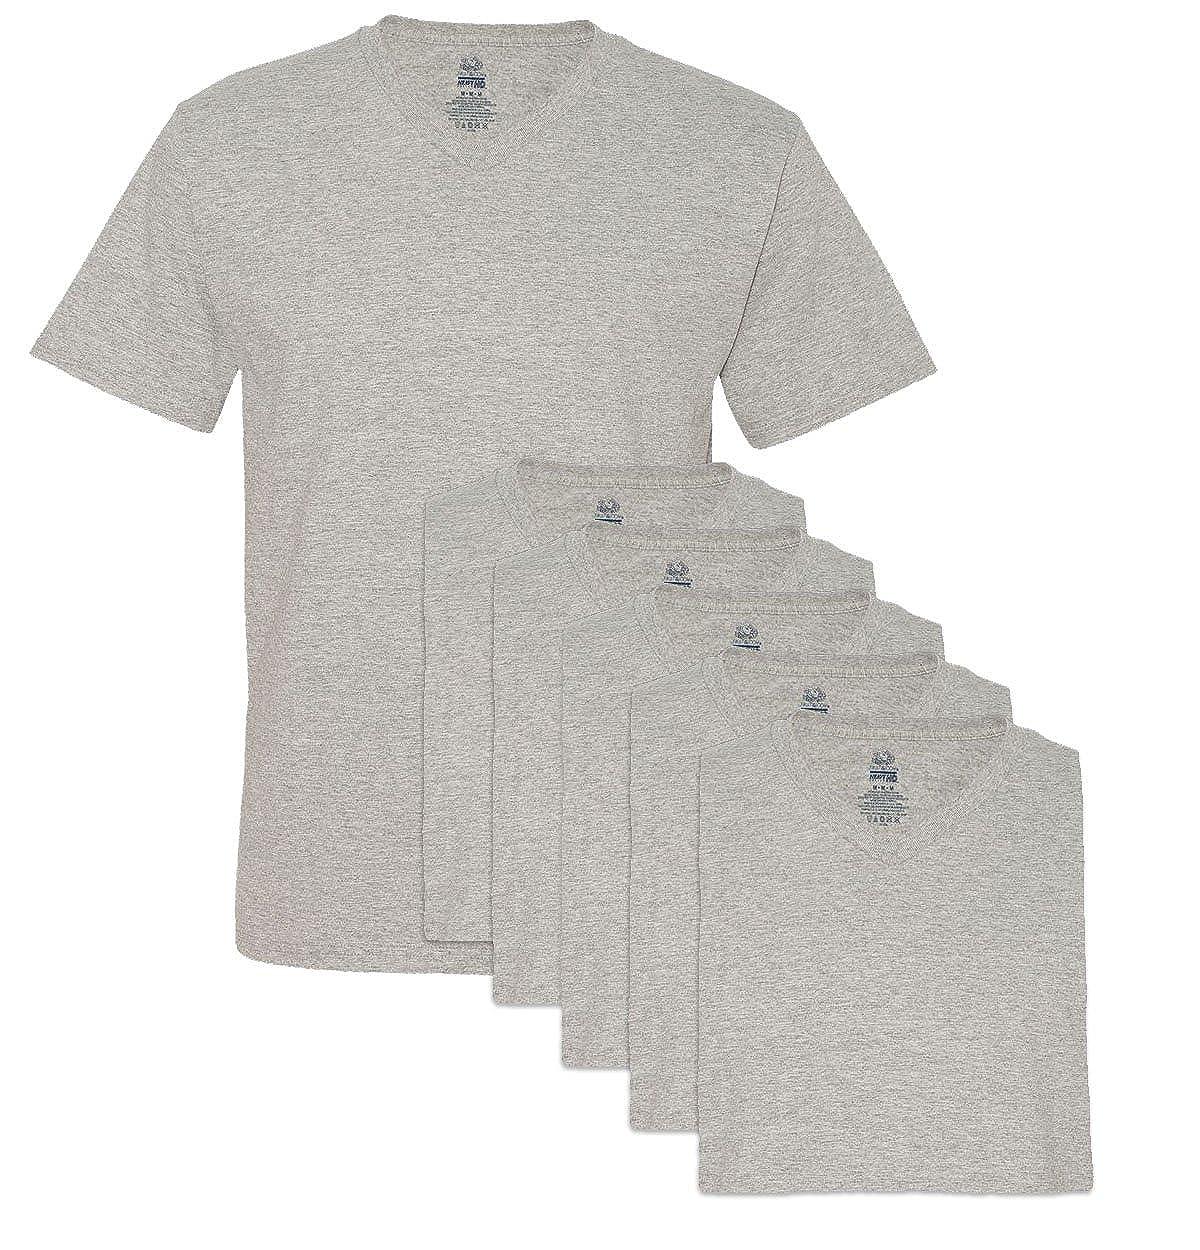 Large Fruit of the Loom Mens 6 Pack V-Neck T-Shirt Athletic Heather